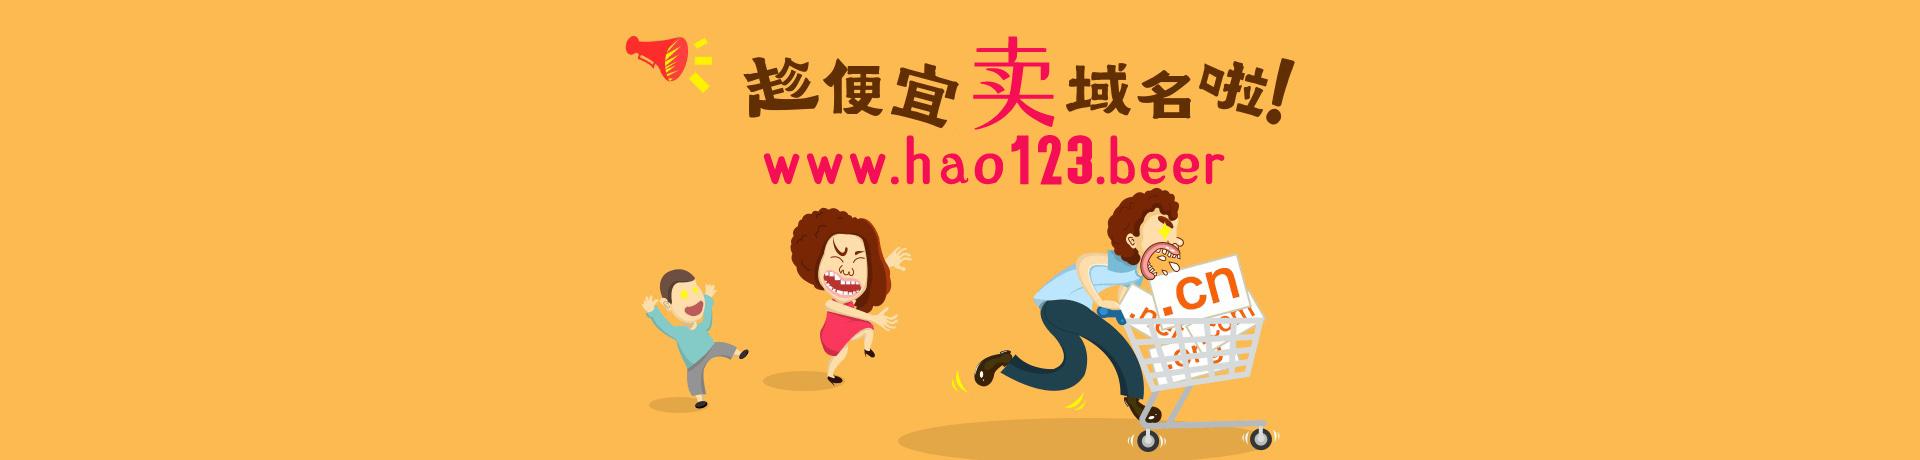 hao123域名低价转让